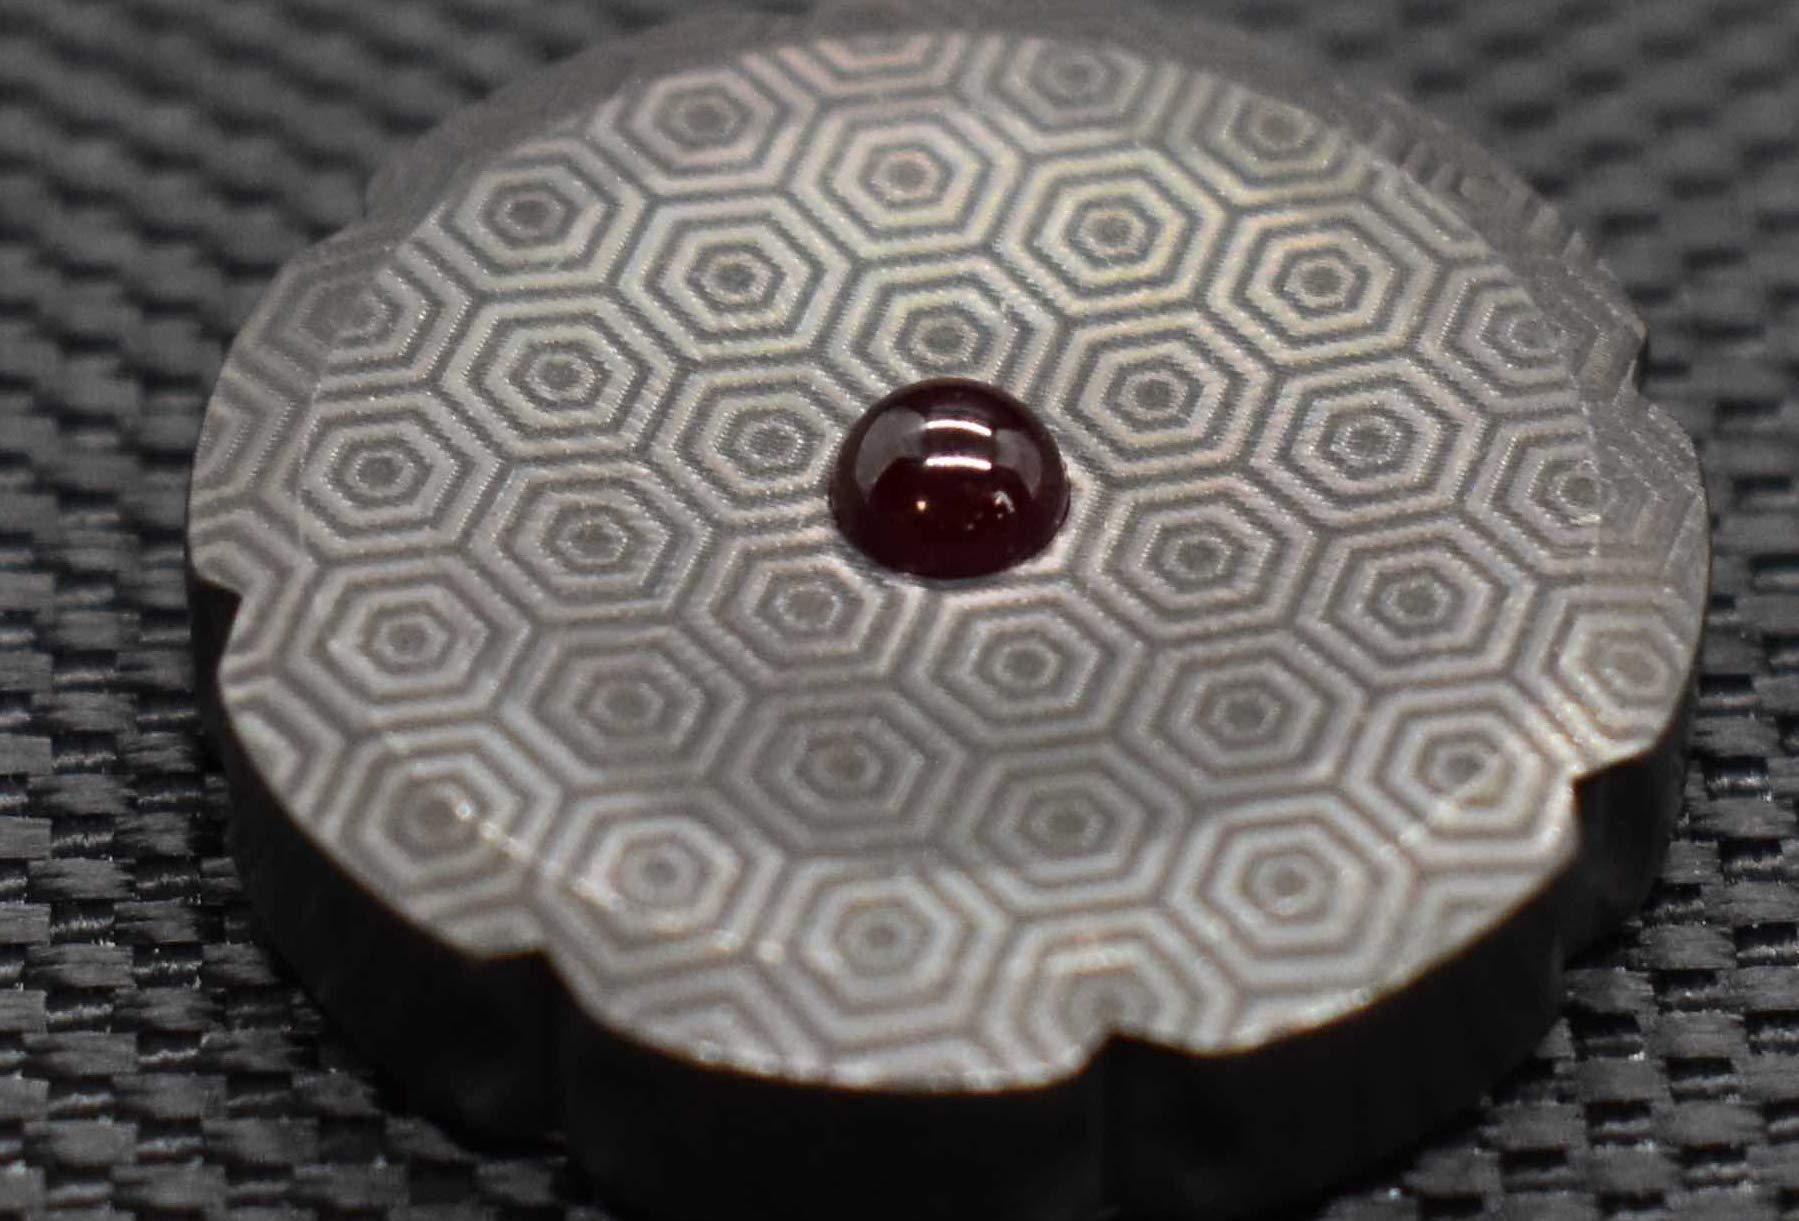 MetonBoss Worry Coin Black Zirconium & Ruby Bearing   Everyday Carry Gear   Precision-Made and Desktop Display by MetonBoss (Image #4)